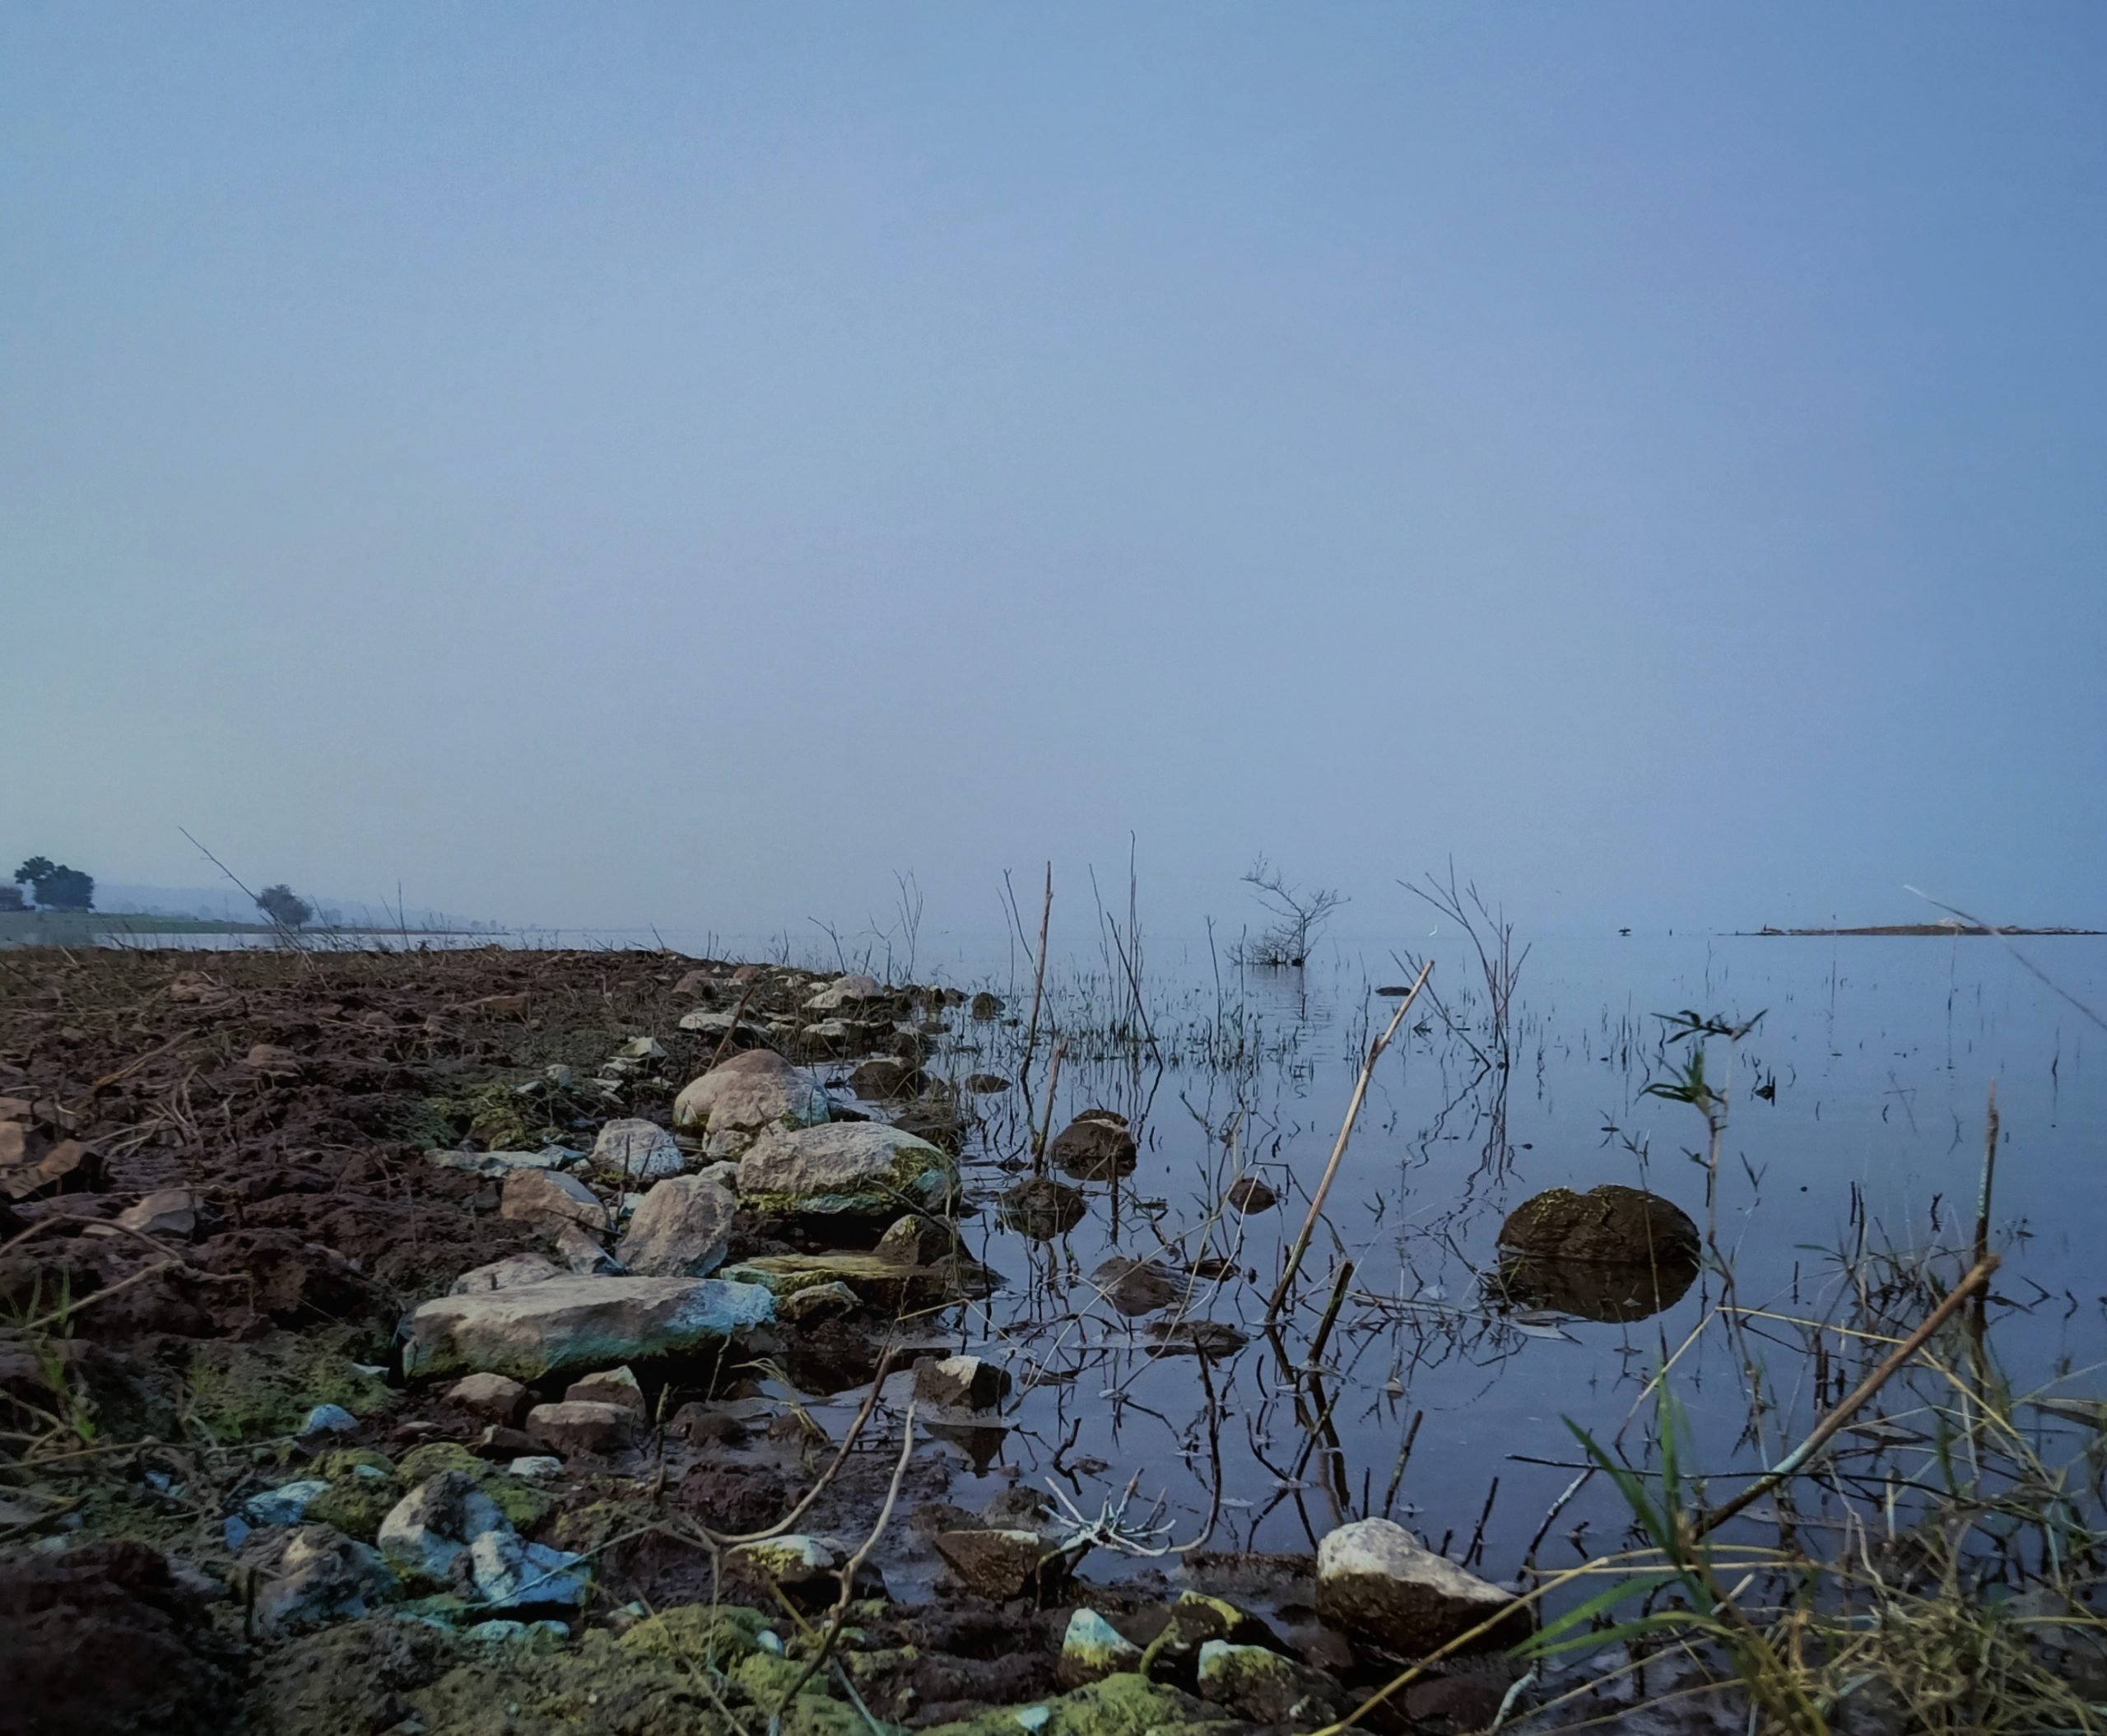 Stones and mud on a seashore